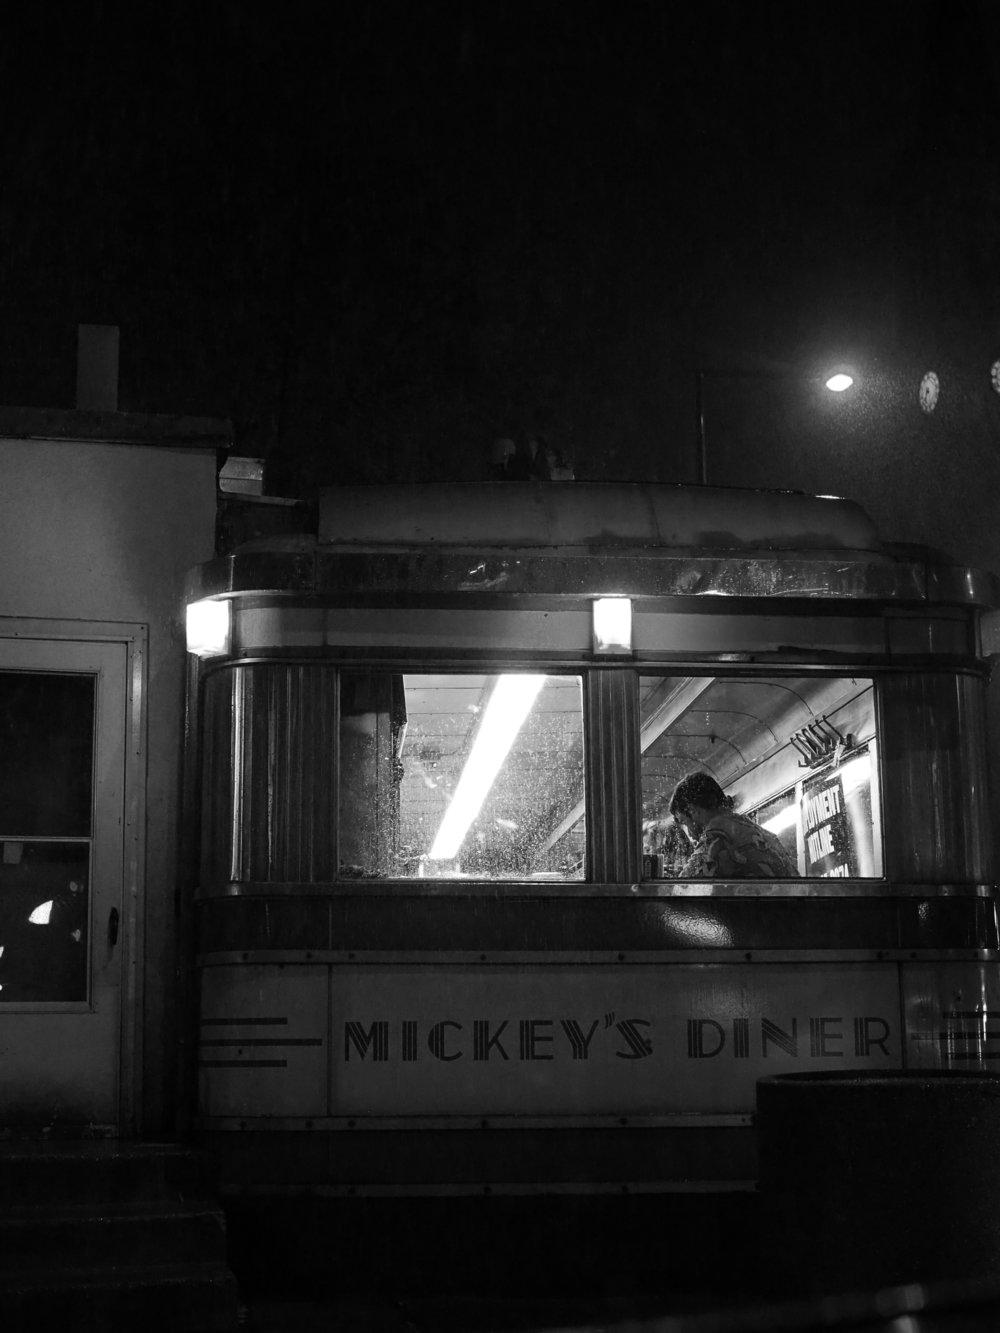 Mickey's Diner. Saint Paul, MN.